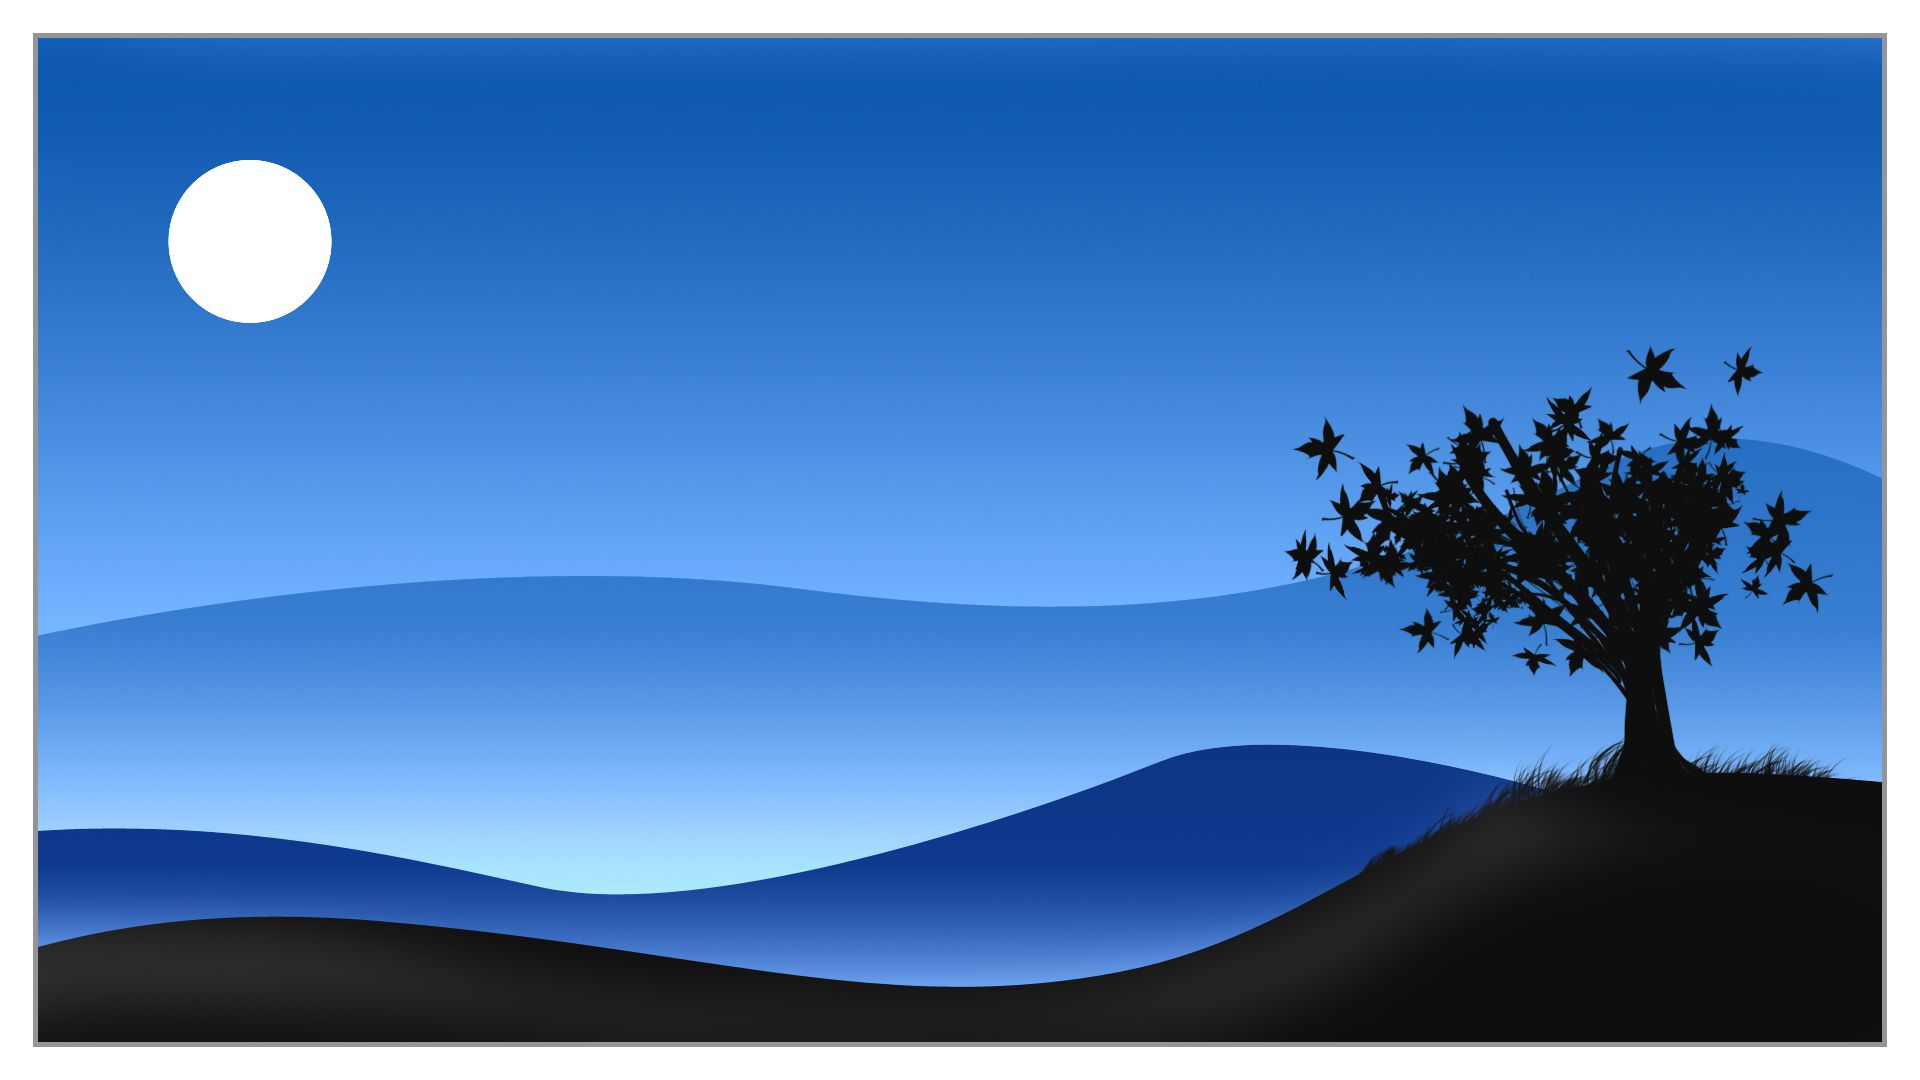 Simple Digital Art Landscape Wallpaper Sunset Art Landscape Photos Art Background